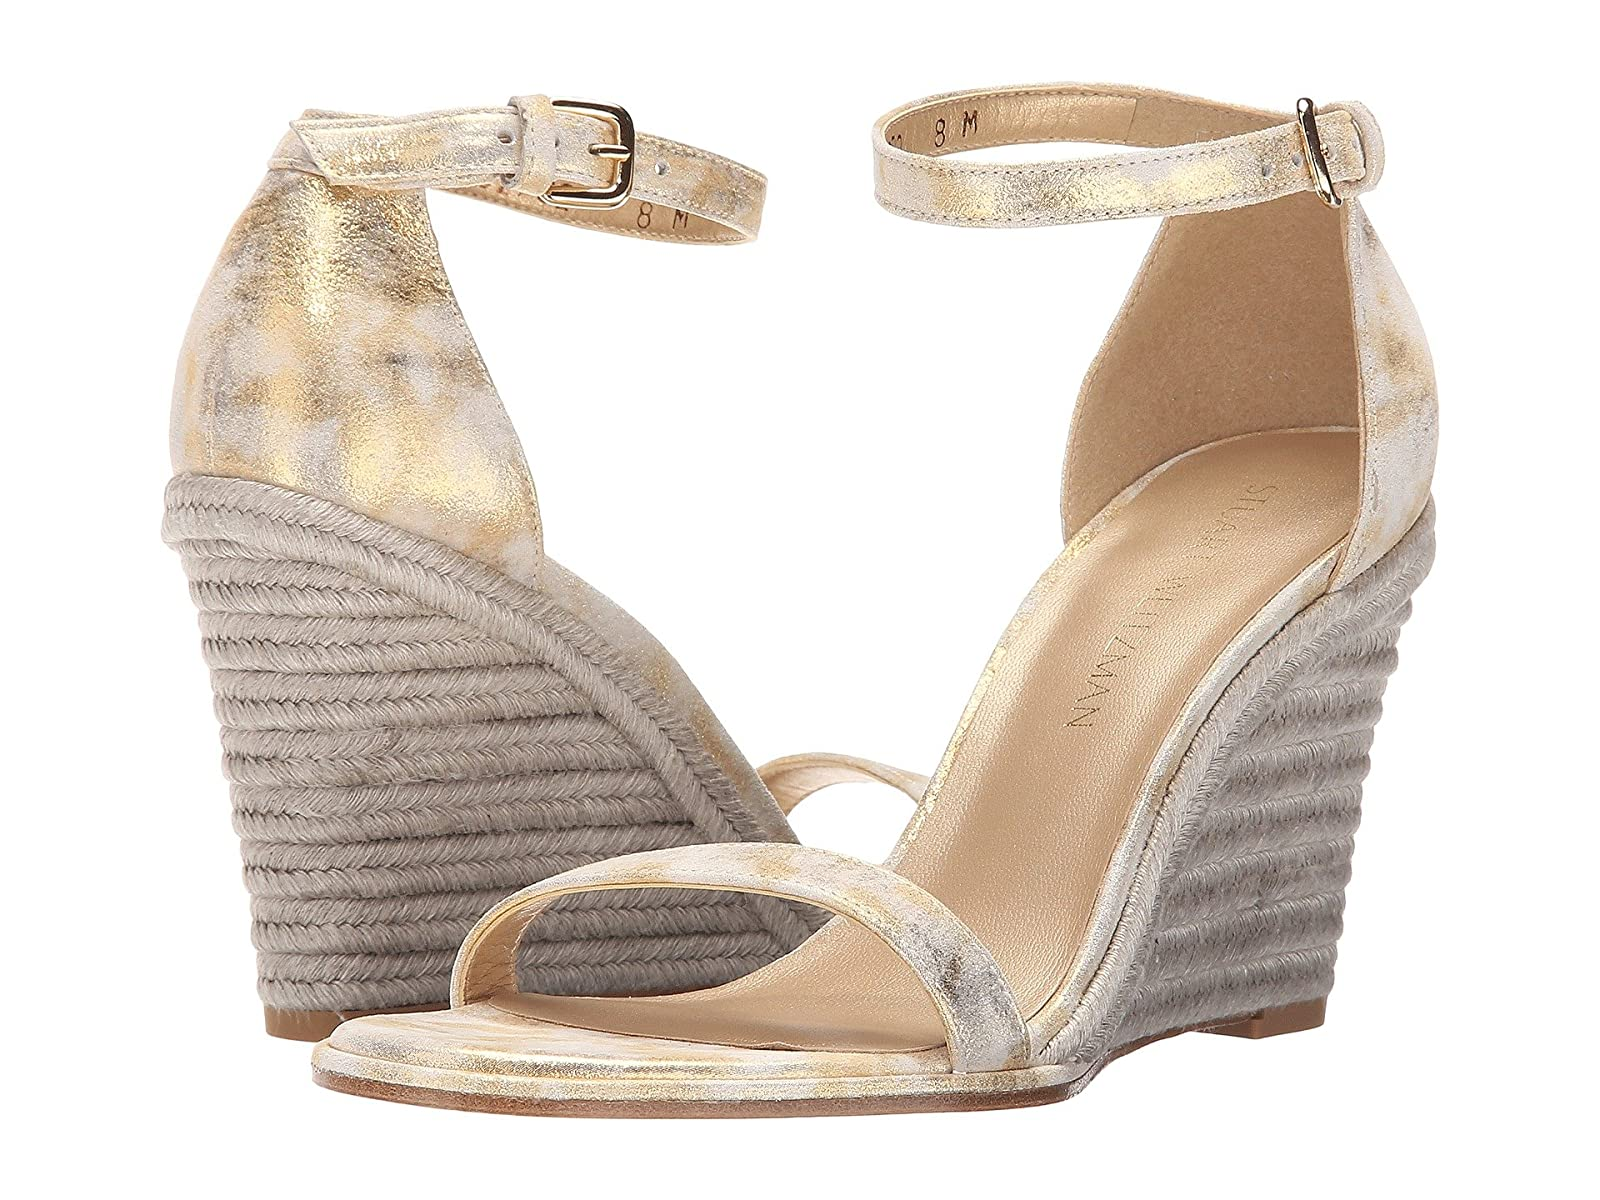 Stuart Weitzman WalkwayCheap and distinctive eye-catching shoes